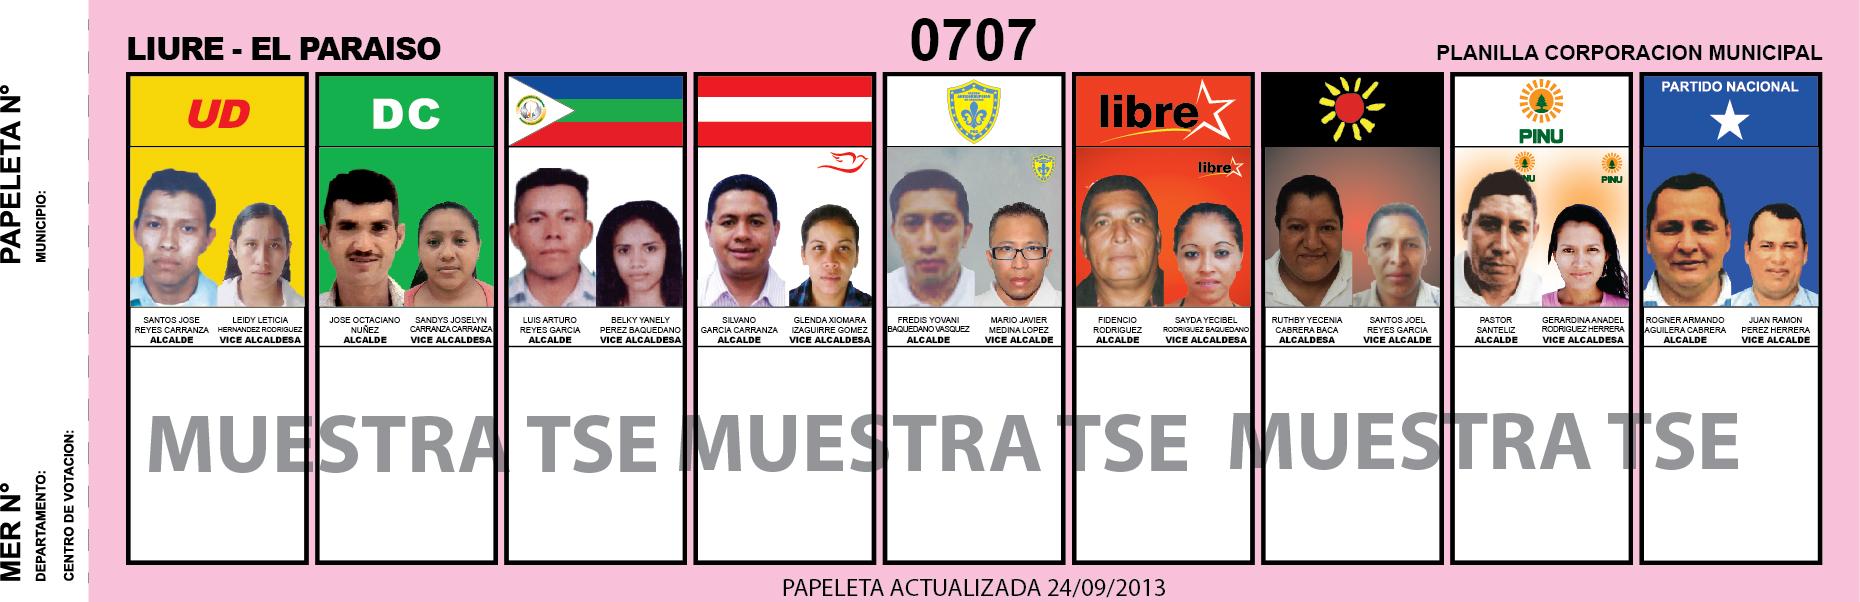 CANDIDATOS 2013 MUNICIPIO LIURE - EL PARAISO - HONDURAS